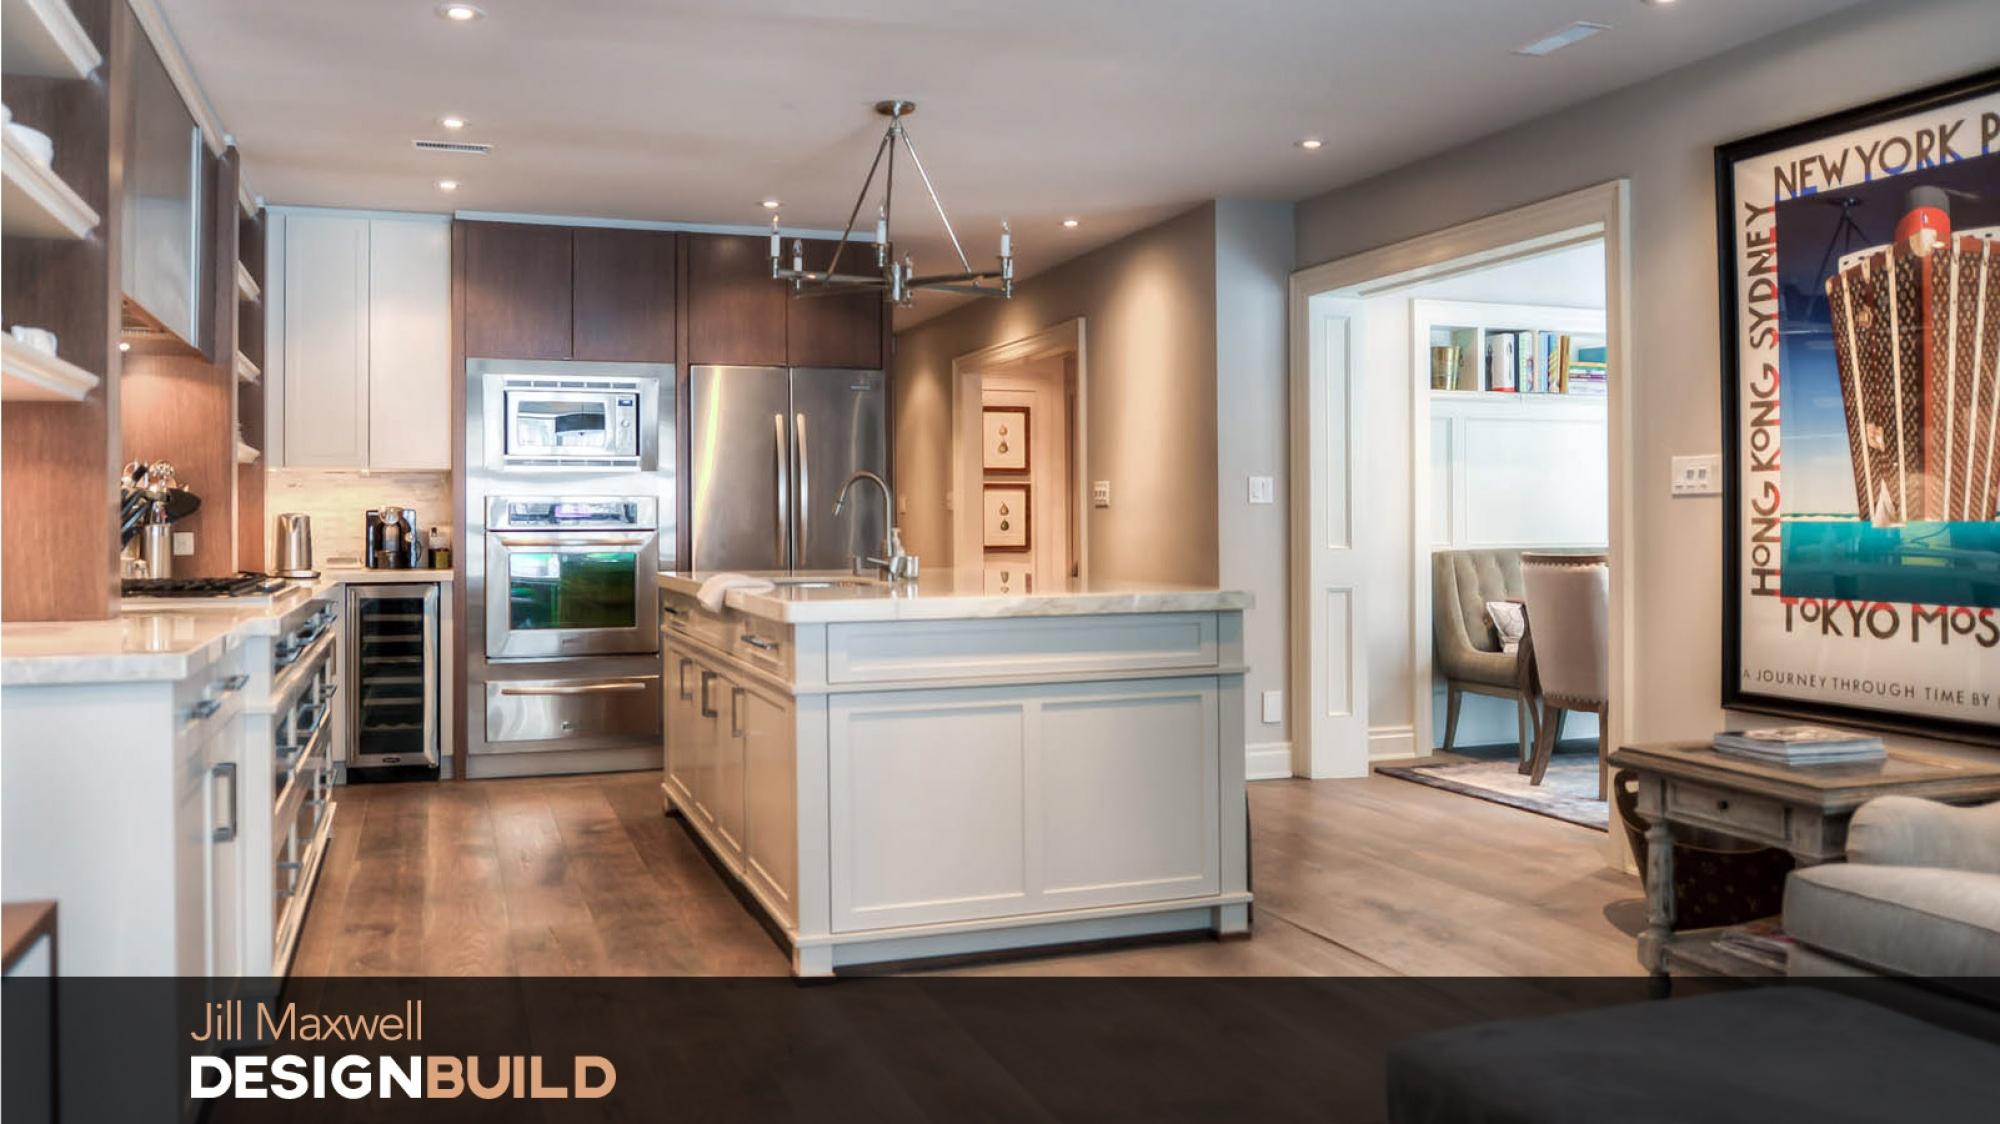 01-1-A-Jill_Maxwell_design_build_5